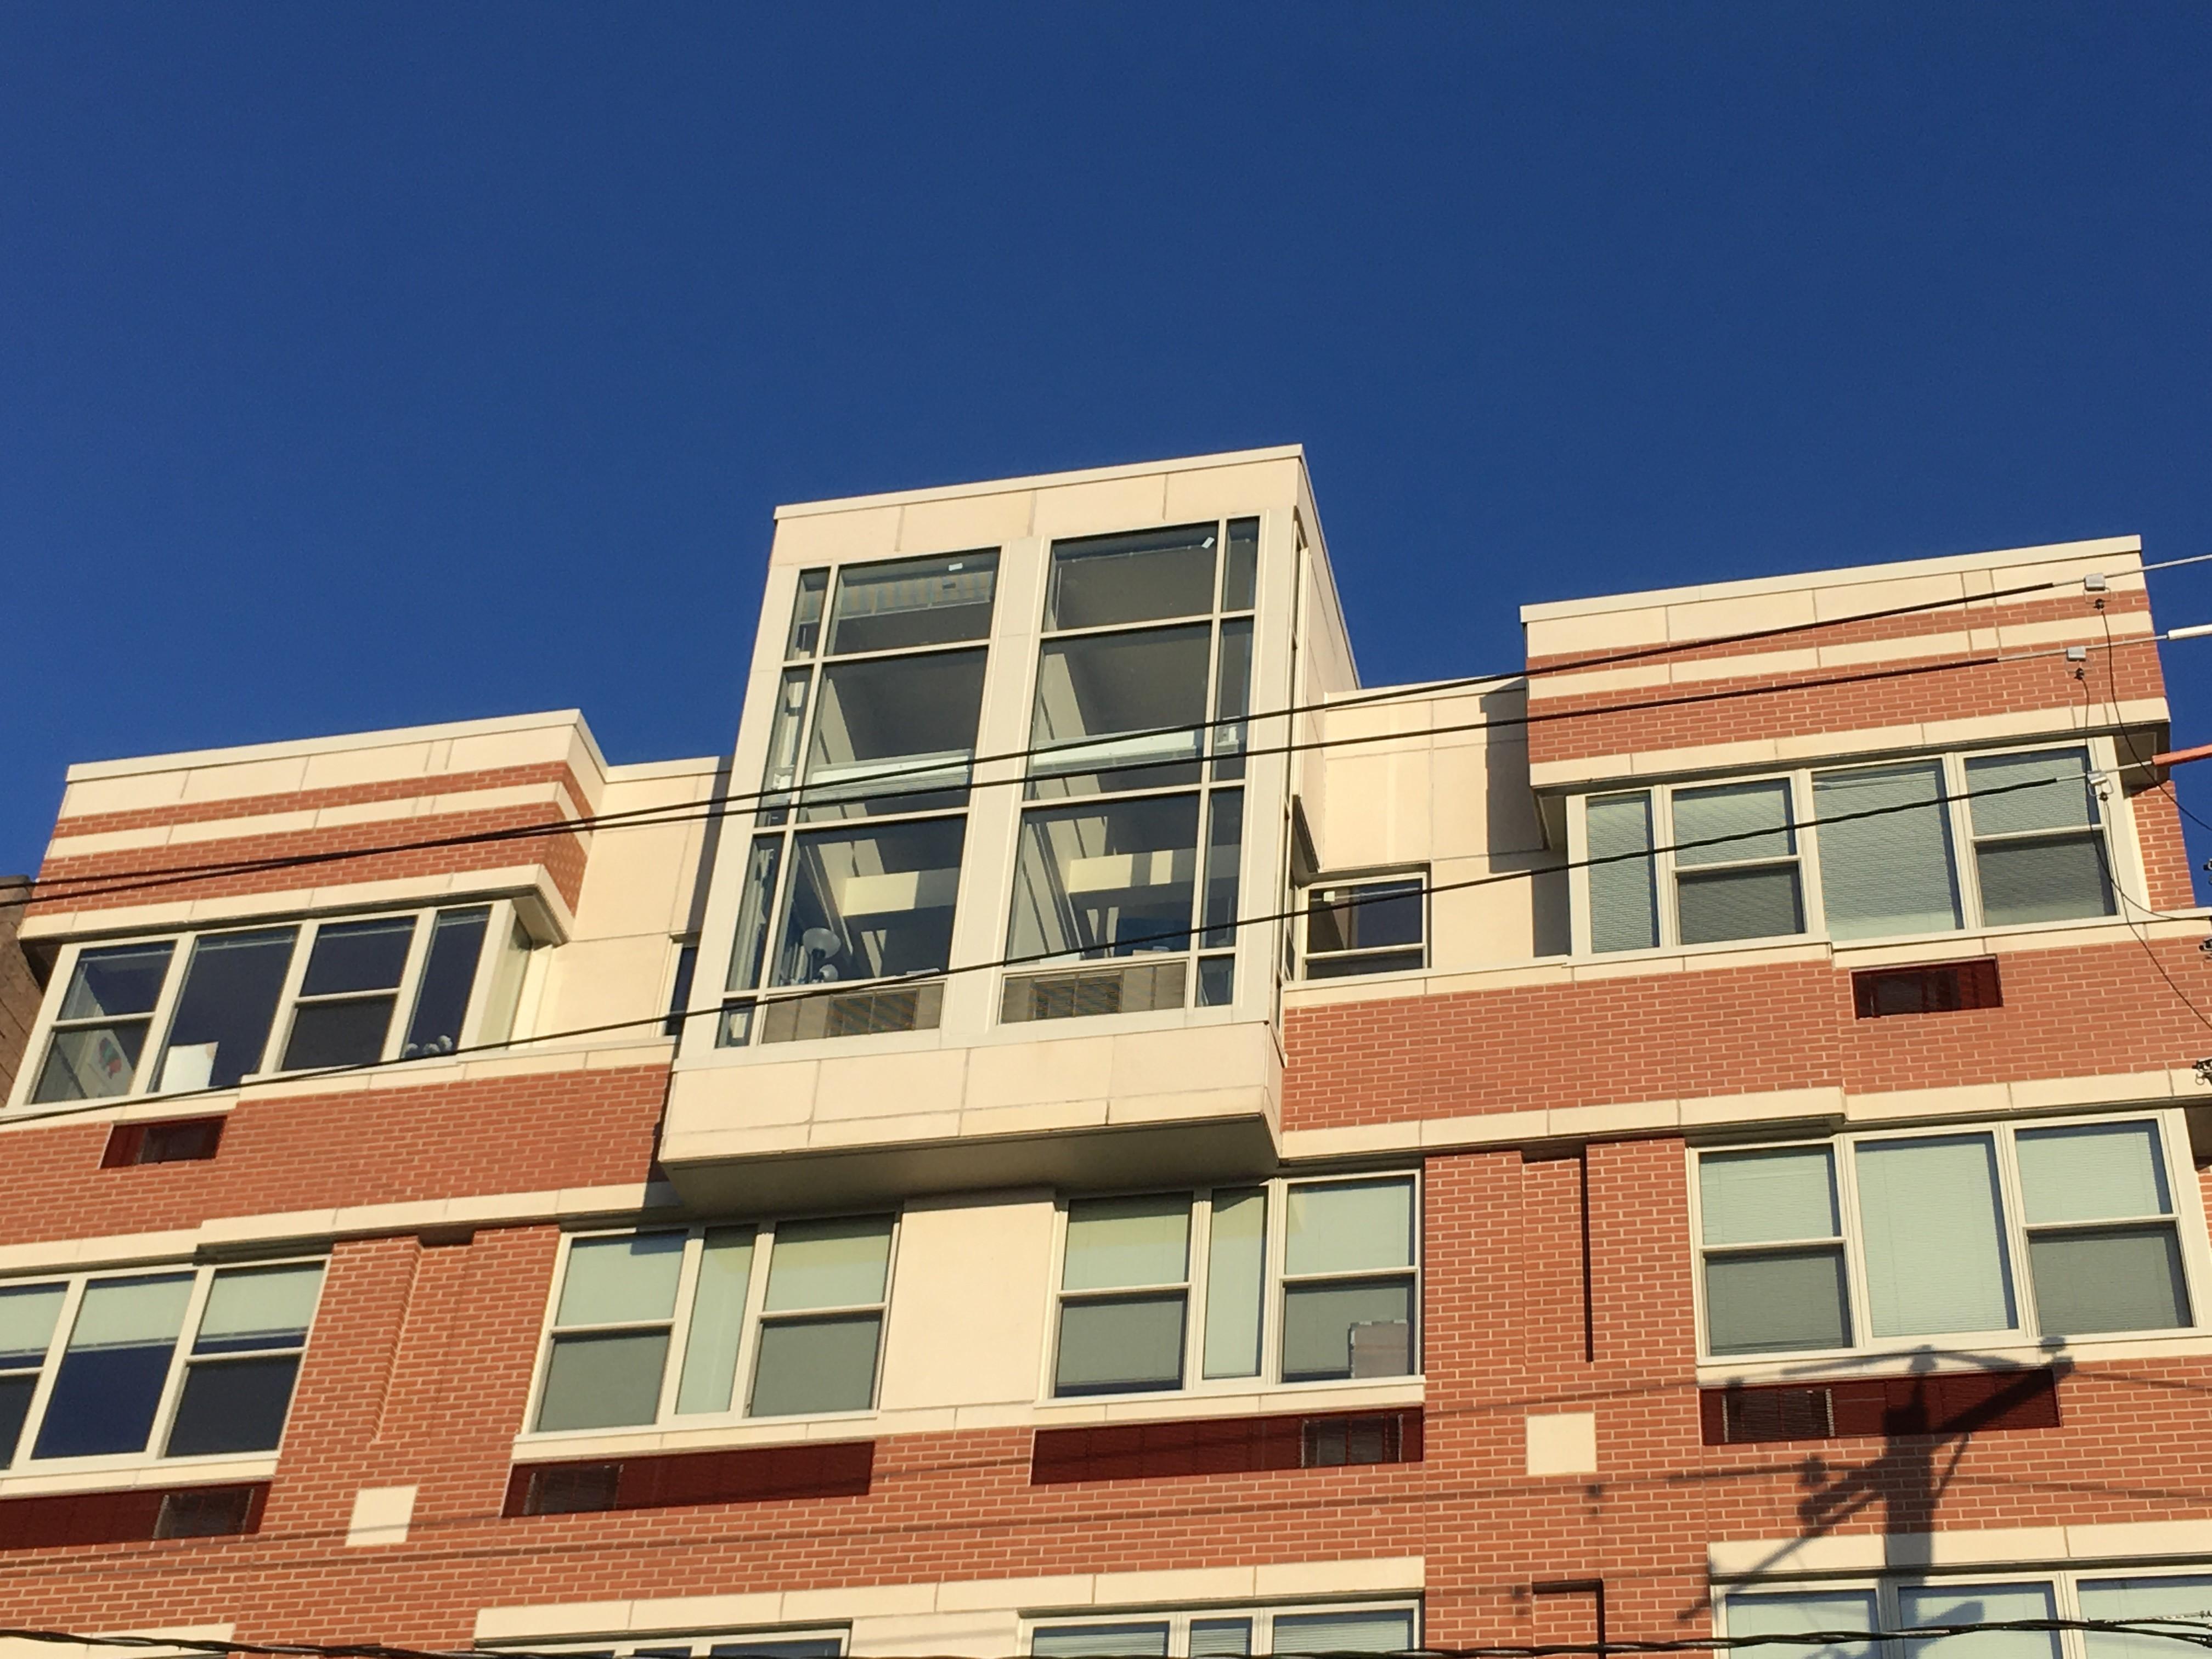 Penthouse exterior